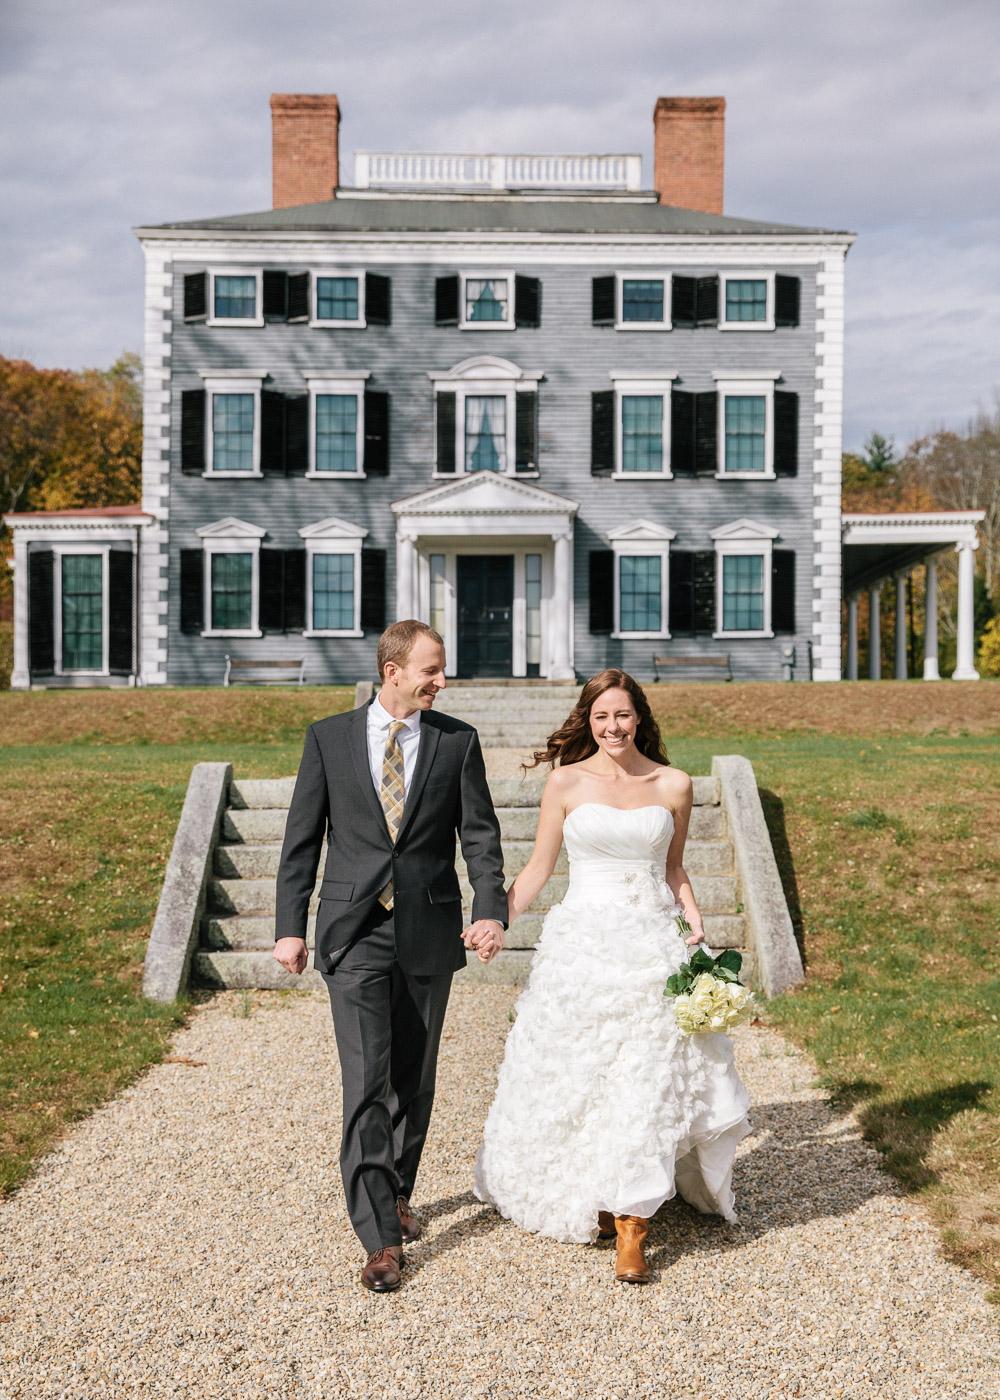 new-england-historic-wedding-photography-michael-tallman-1